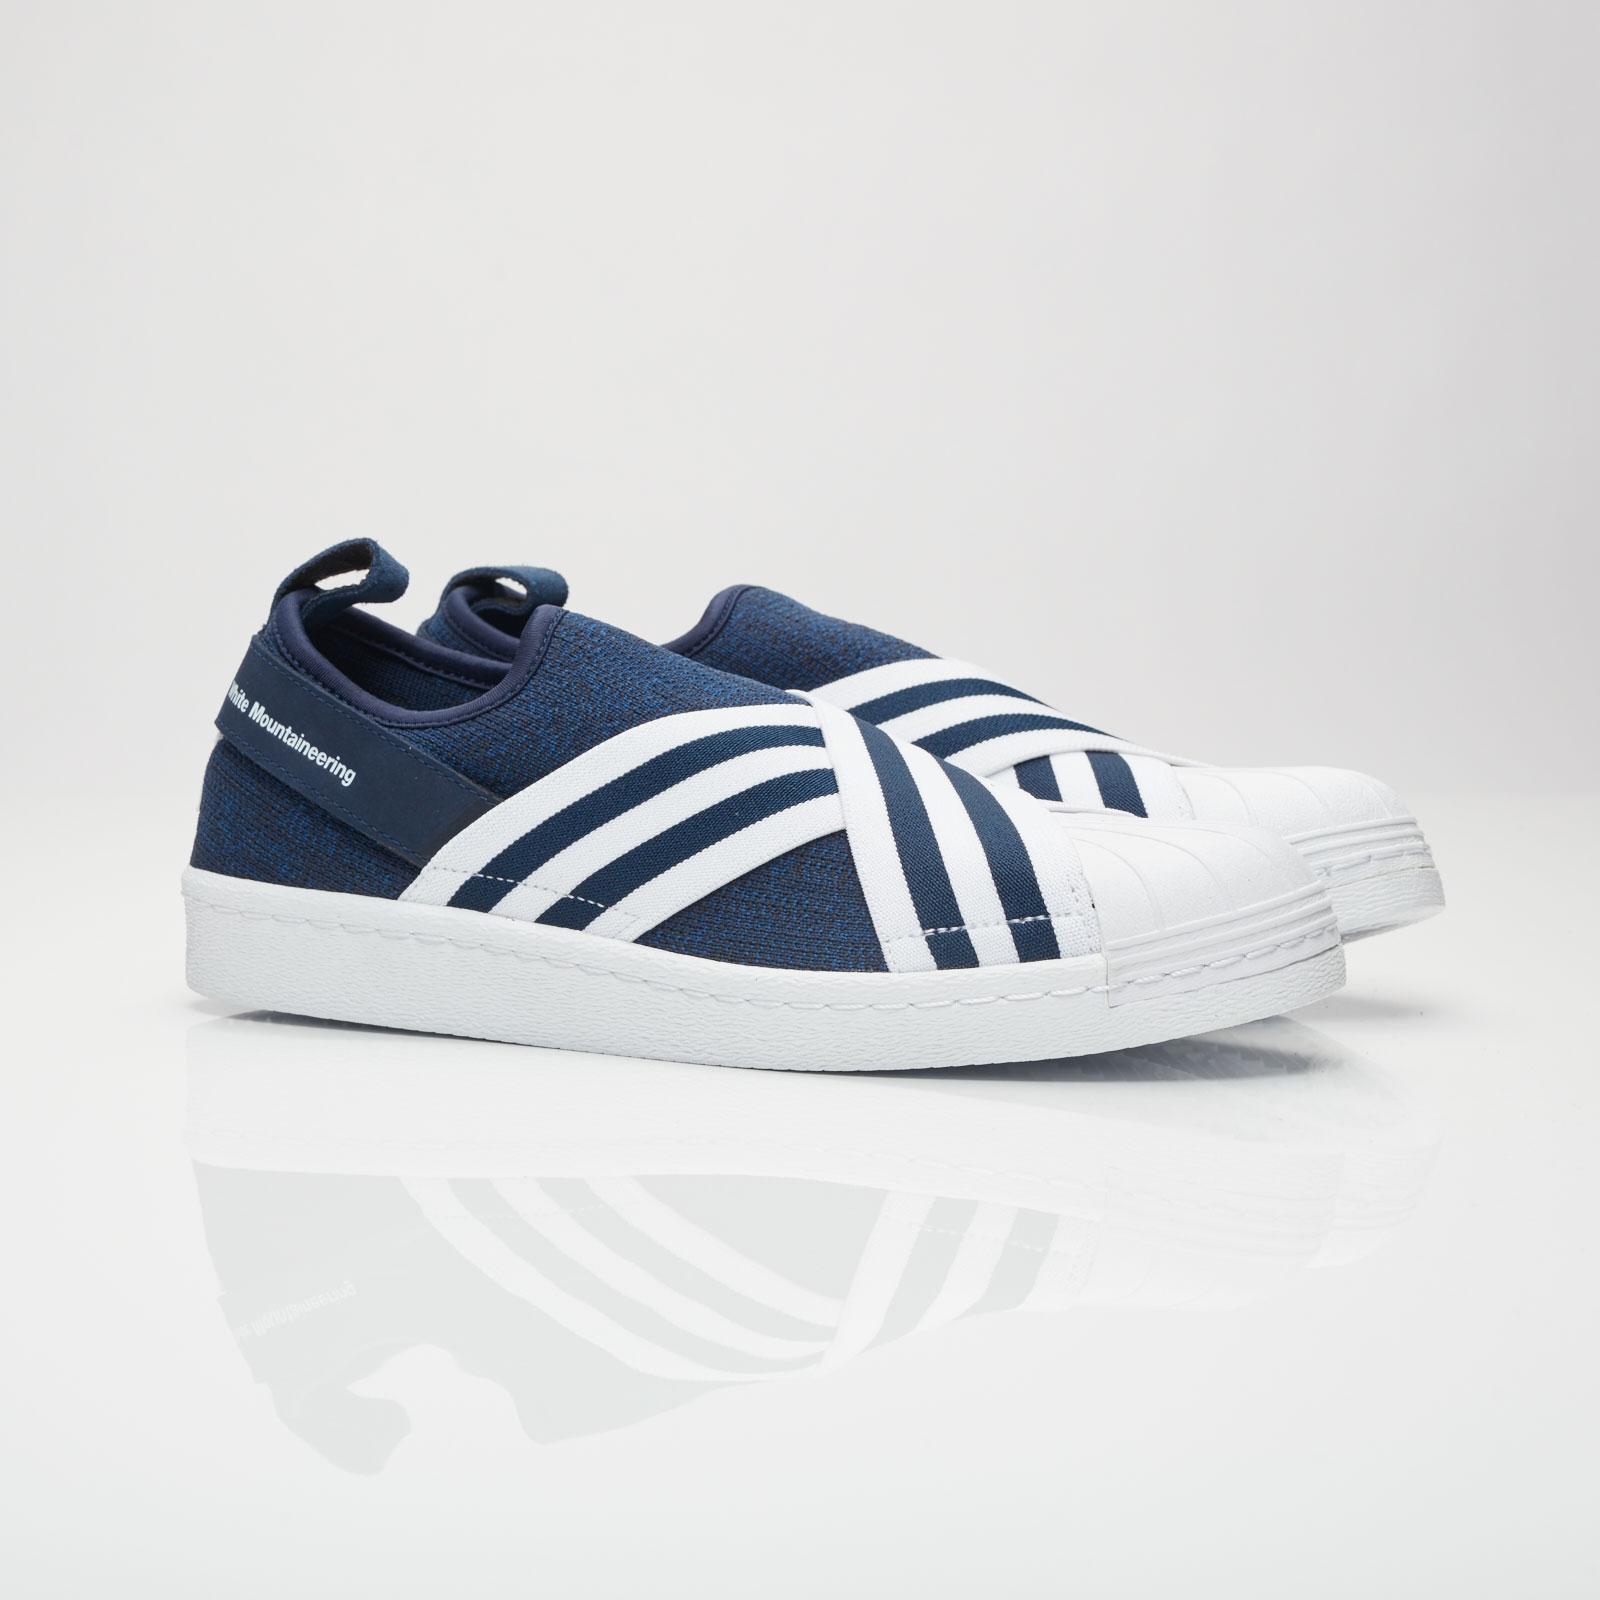 Superstar Slip On WM White Sneakers Adidas | WOMEN | ShoeChapter